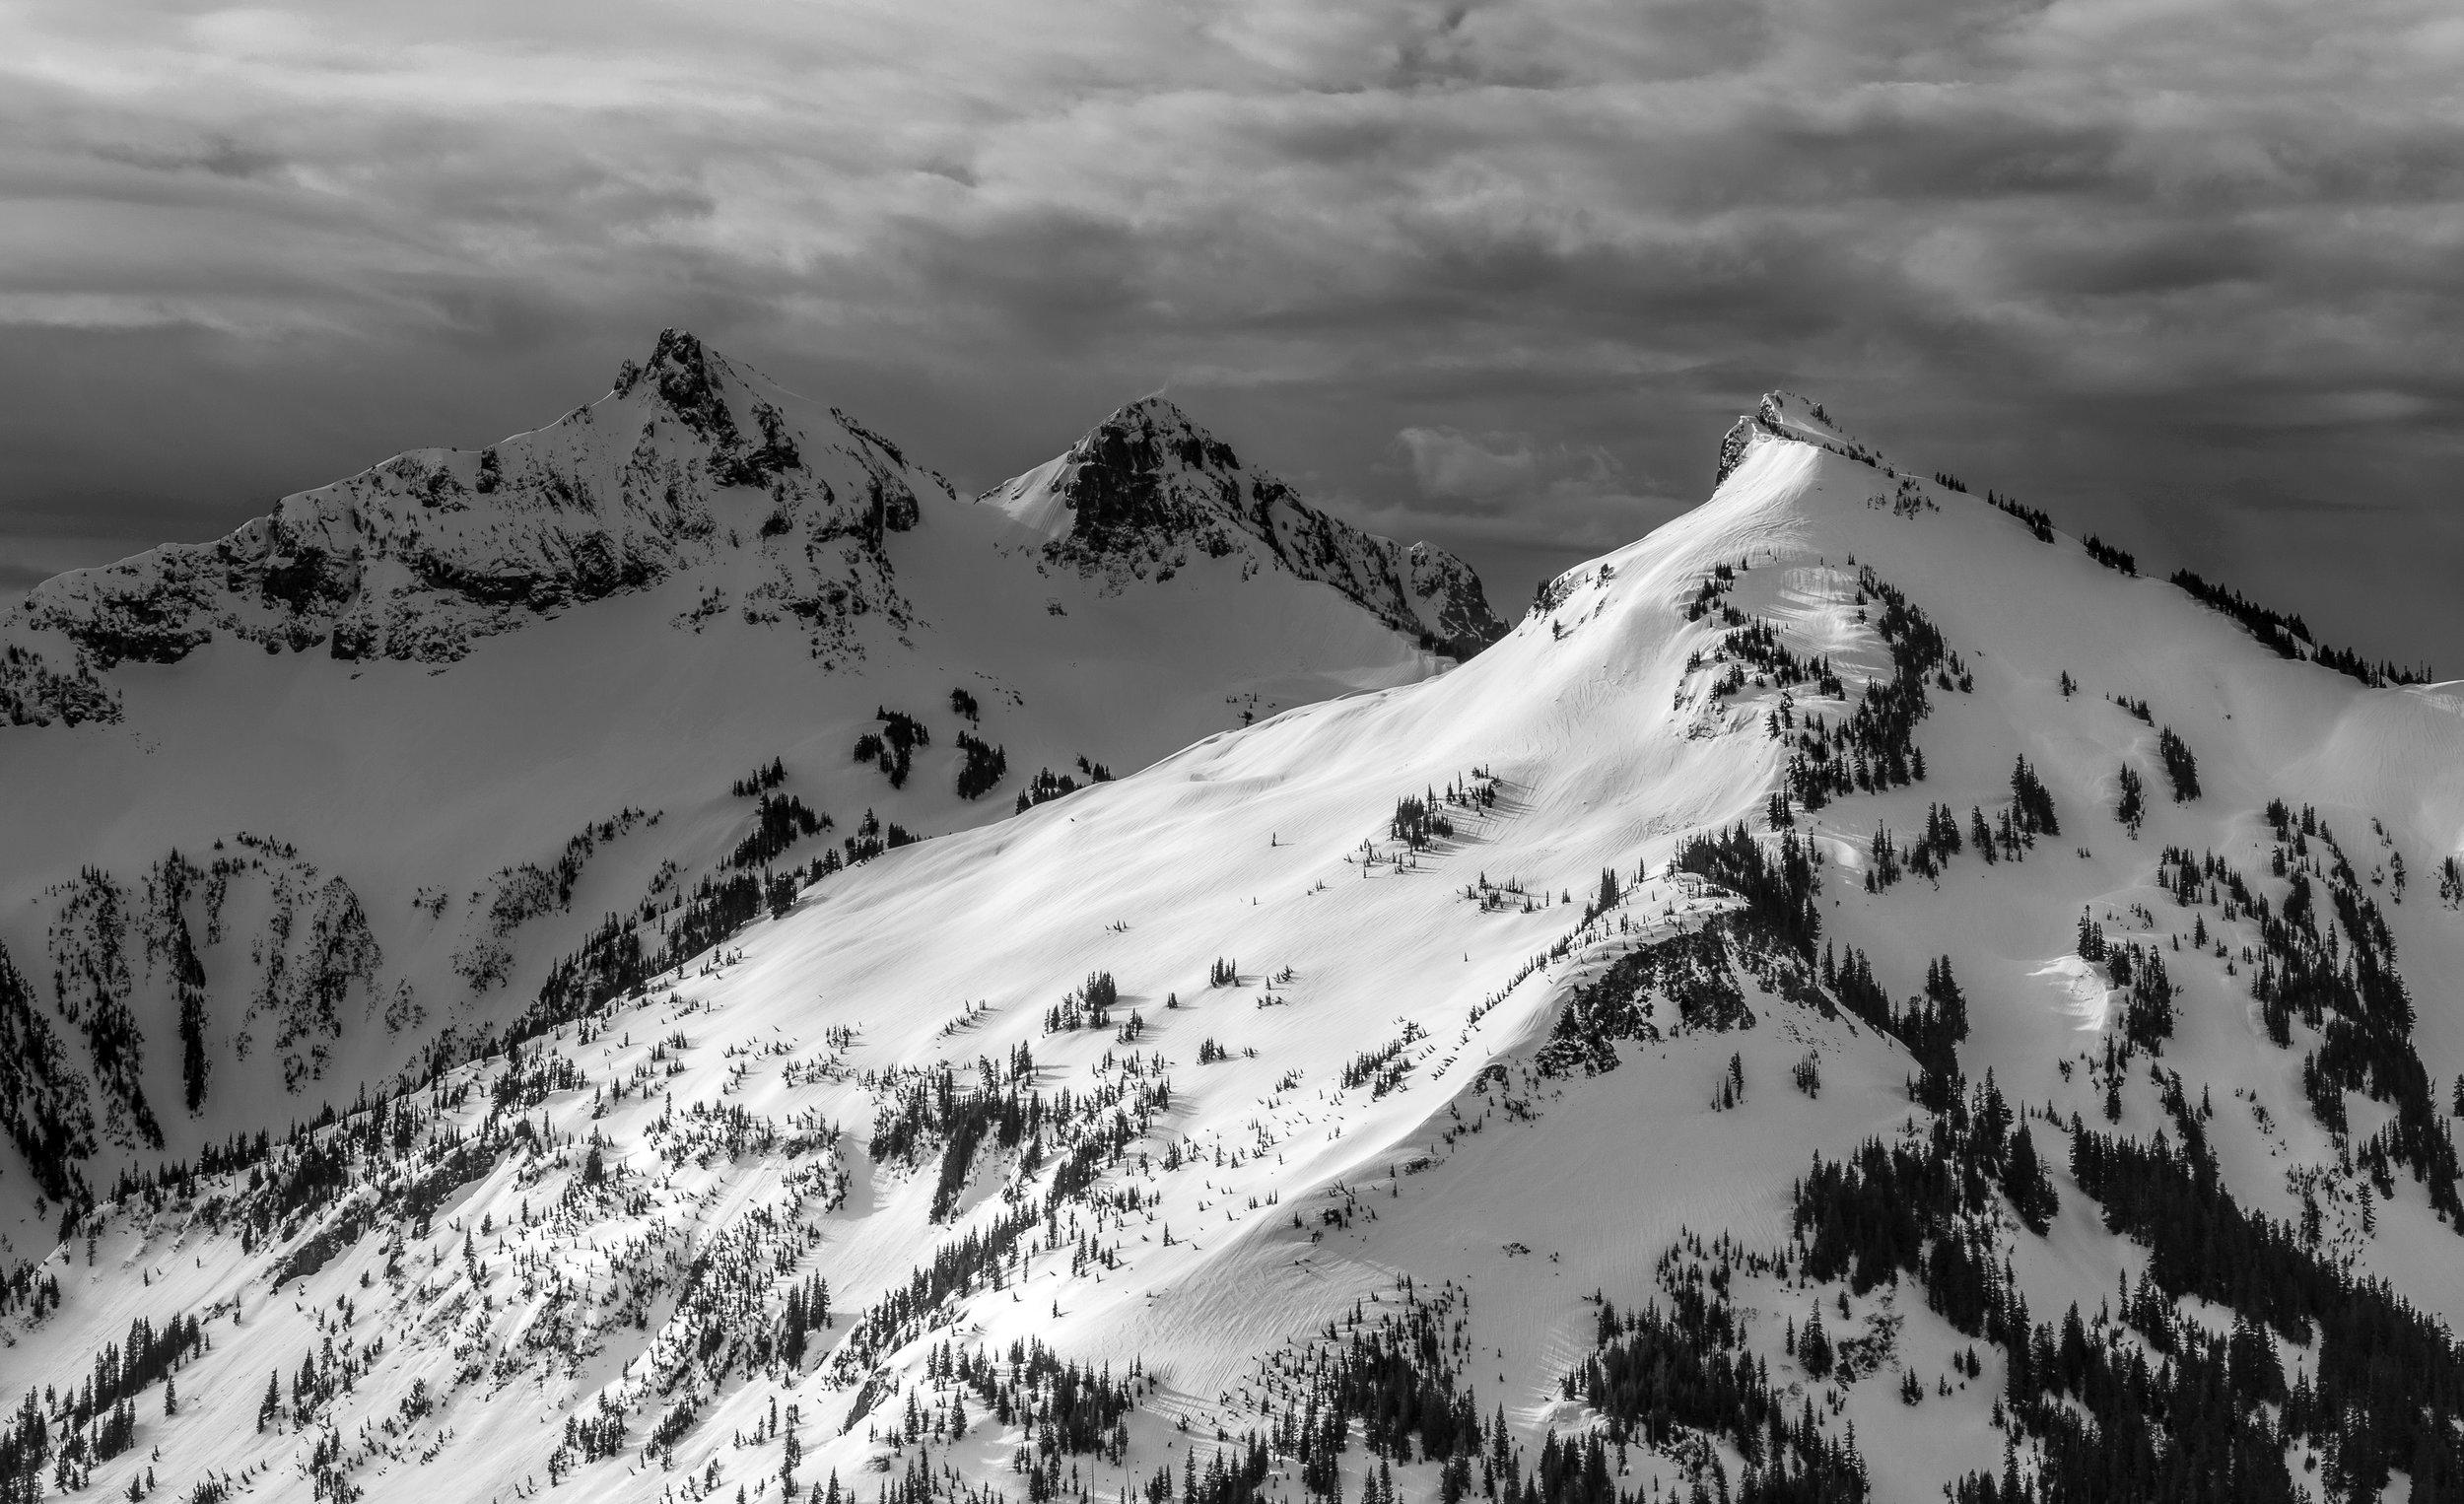 Unicorn Peak (left) and Manatee Mountain (right) of the Tatoosh Range, Mount Rainier National Park, WA